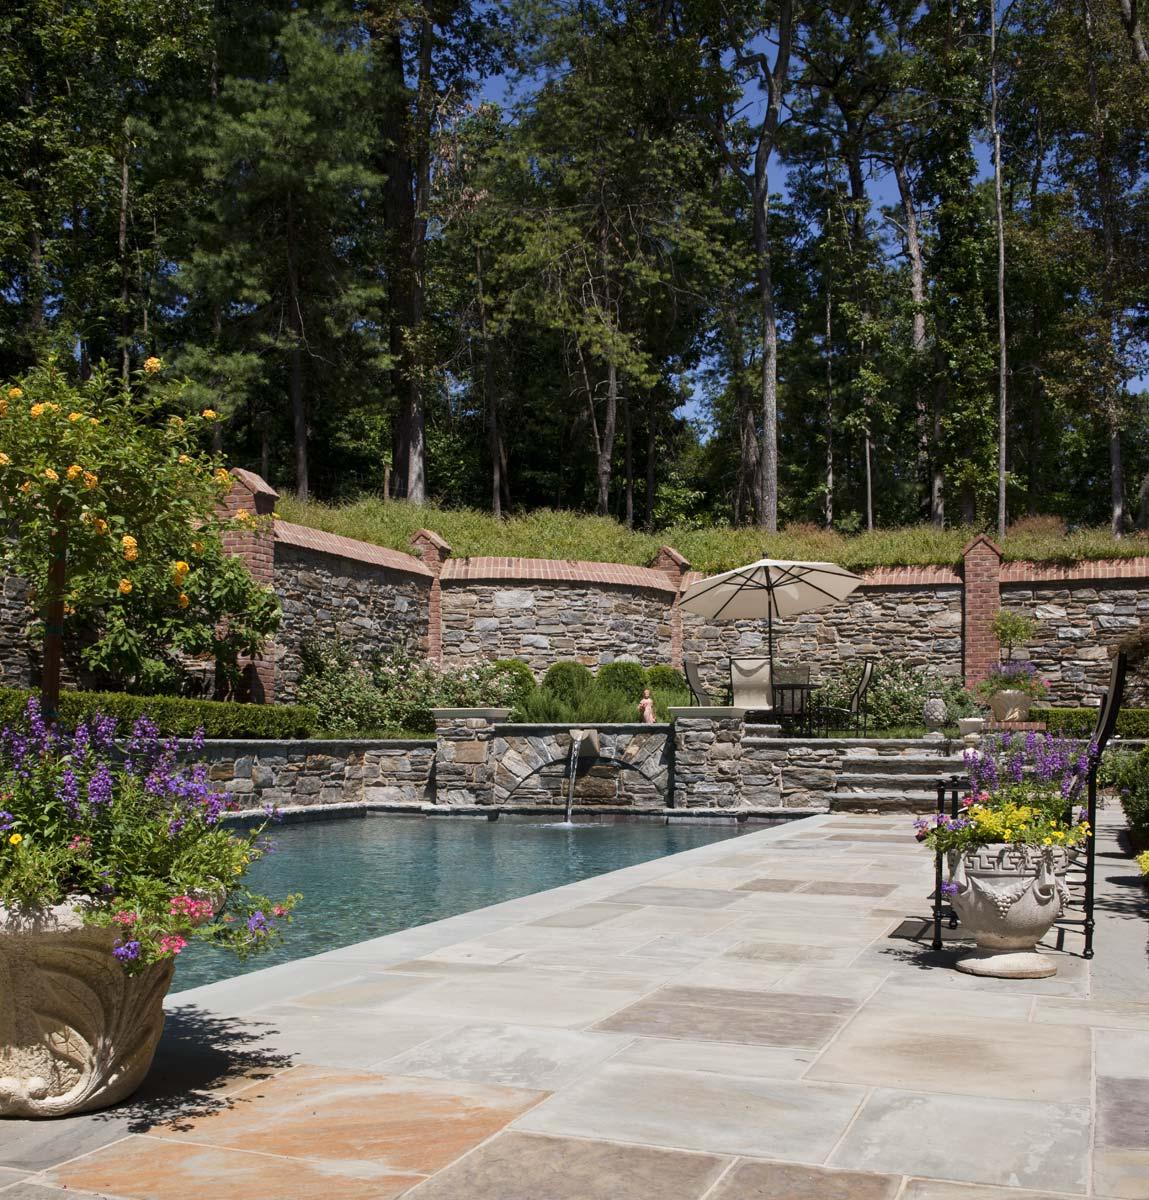 Graggamoore Estate Poolside Terrace